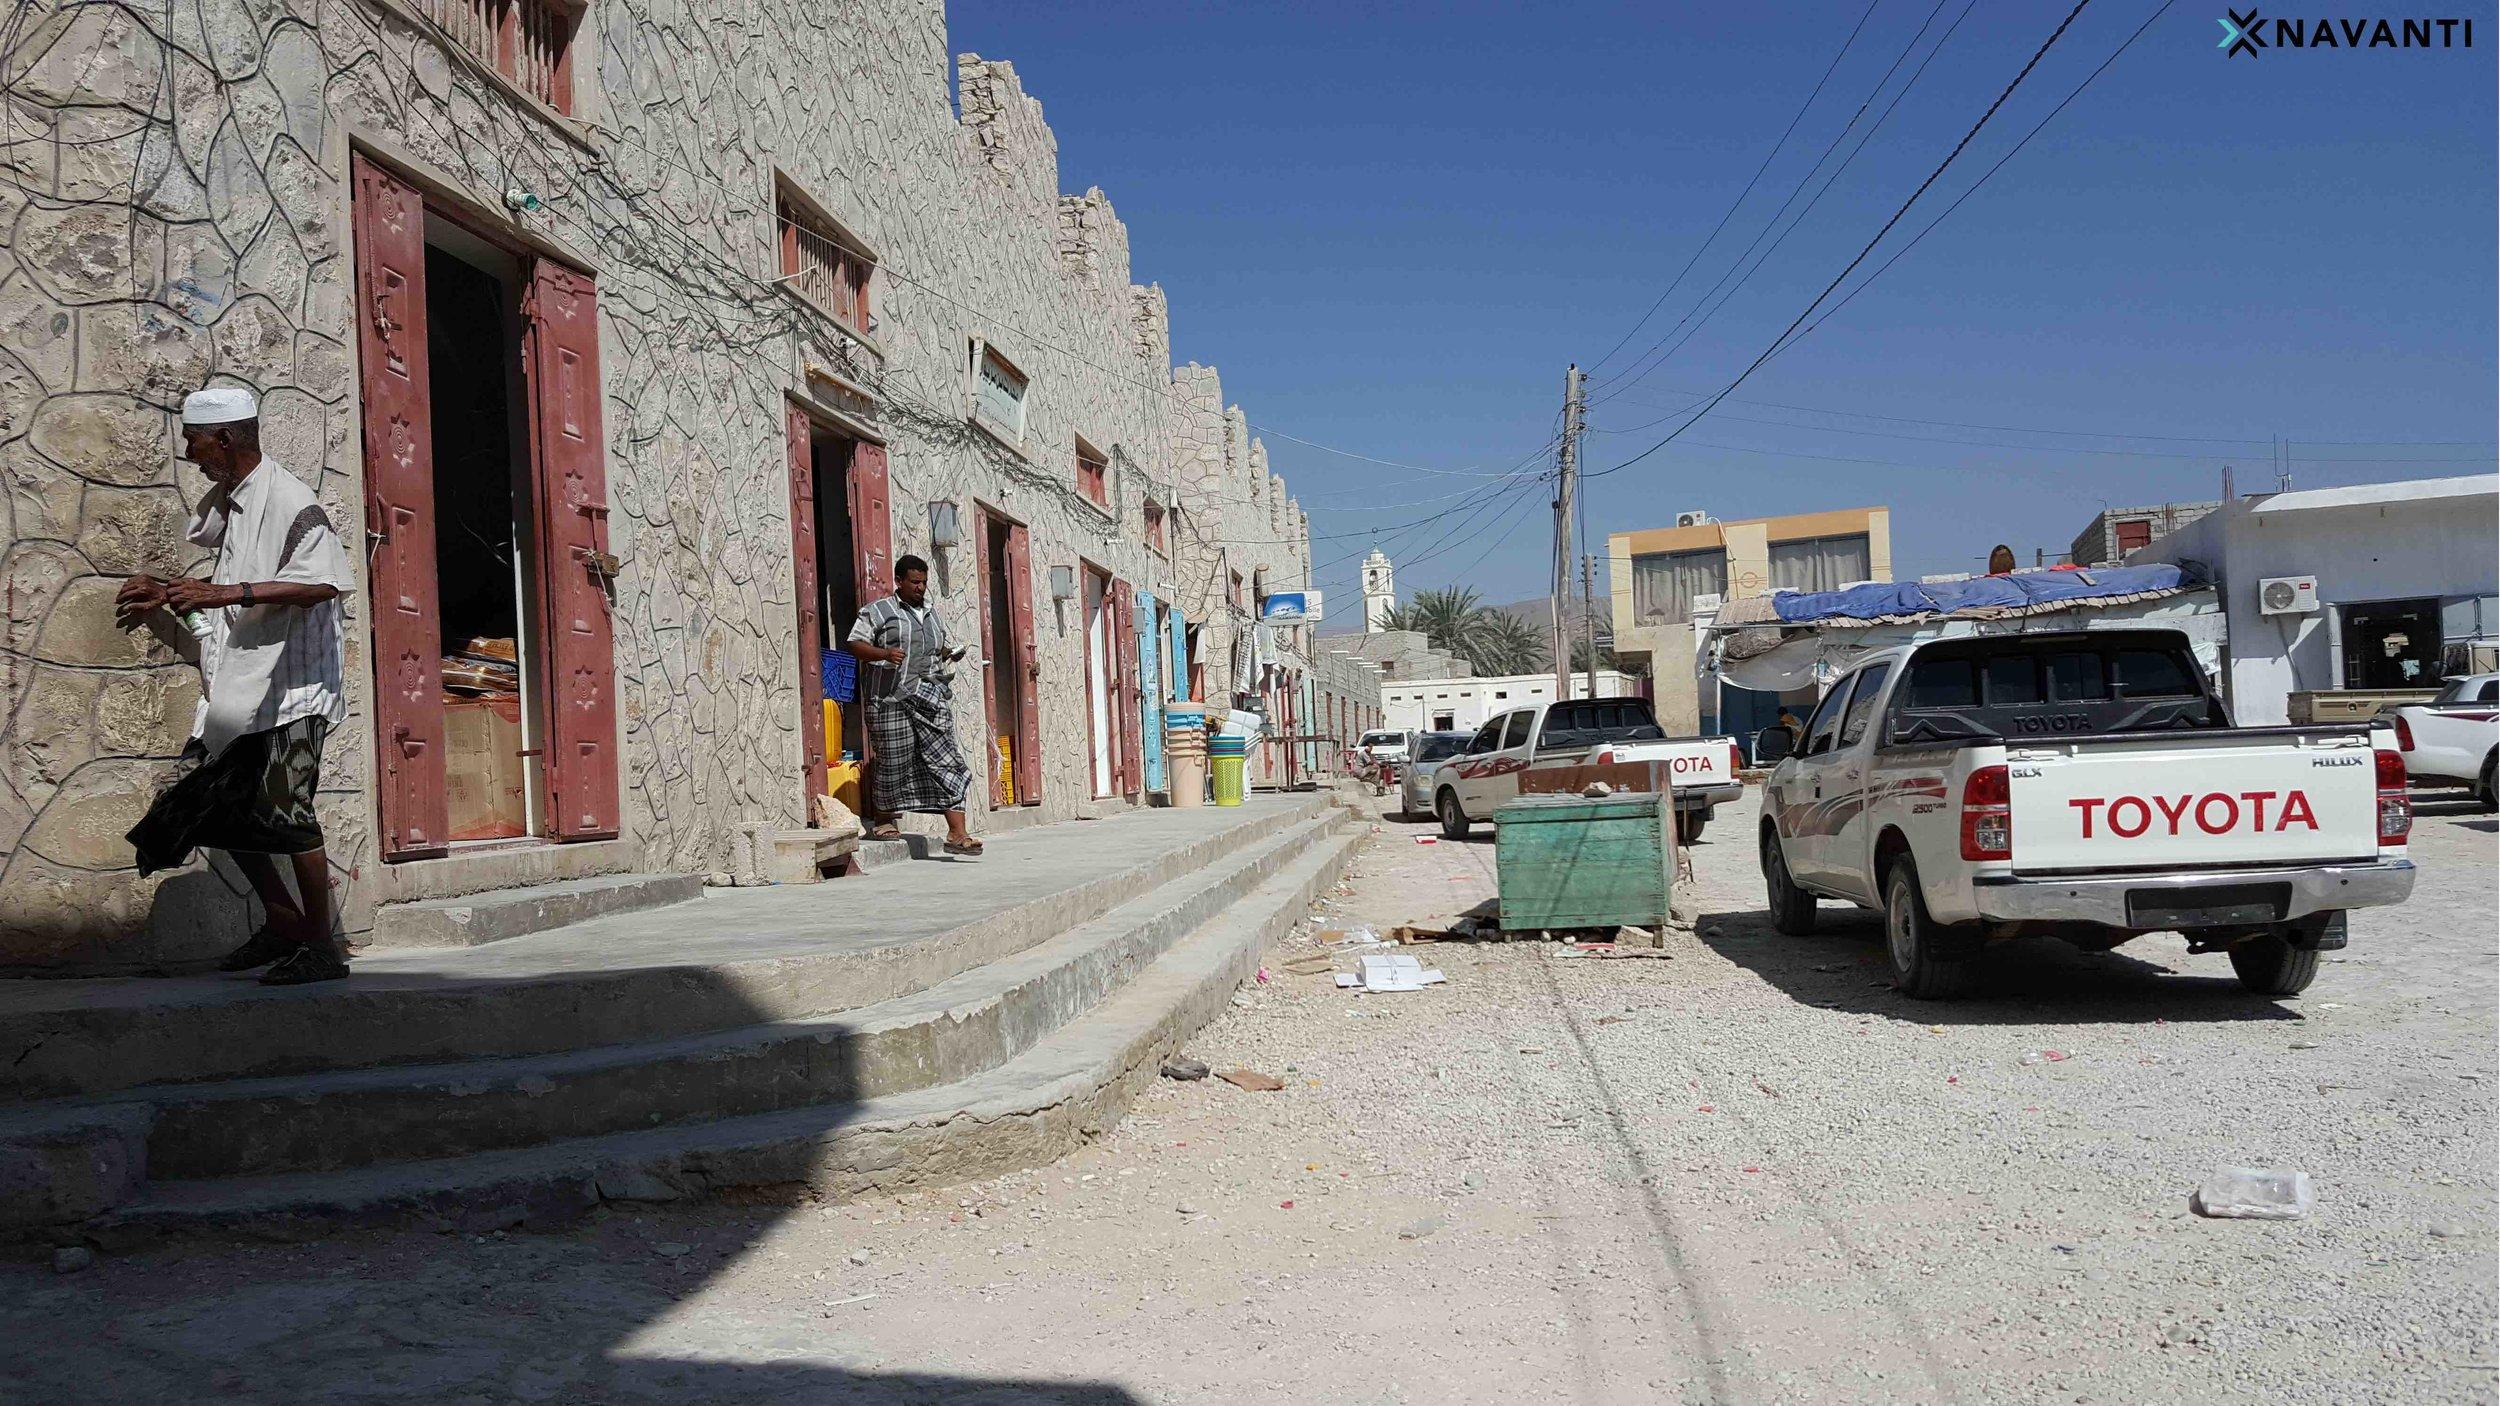 Market in the town of Sayhut, al-Mahra. Source: Navanti.